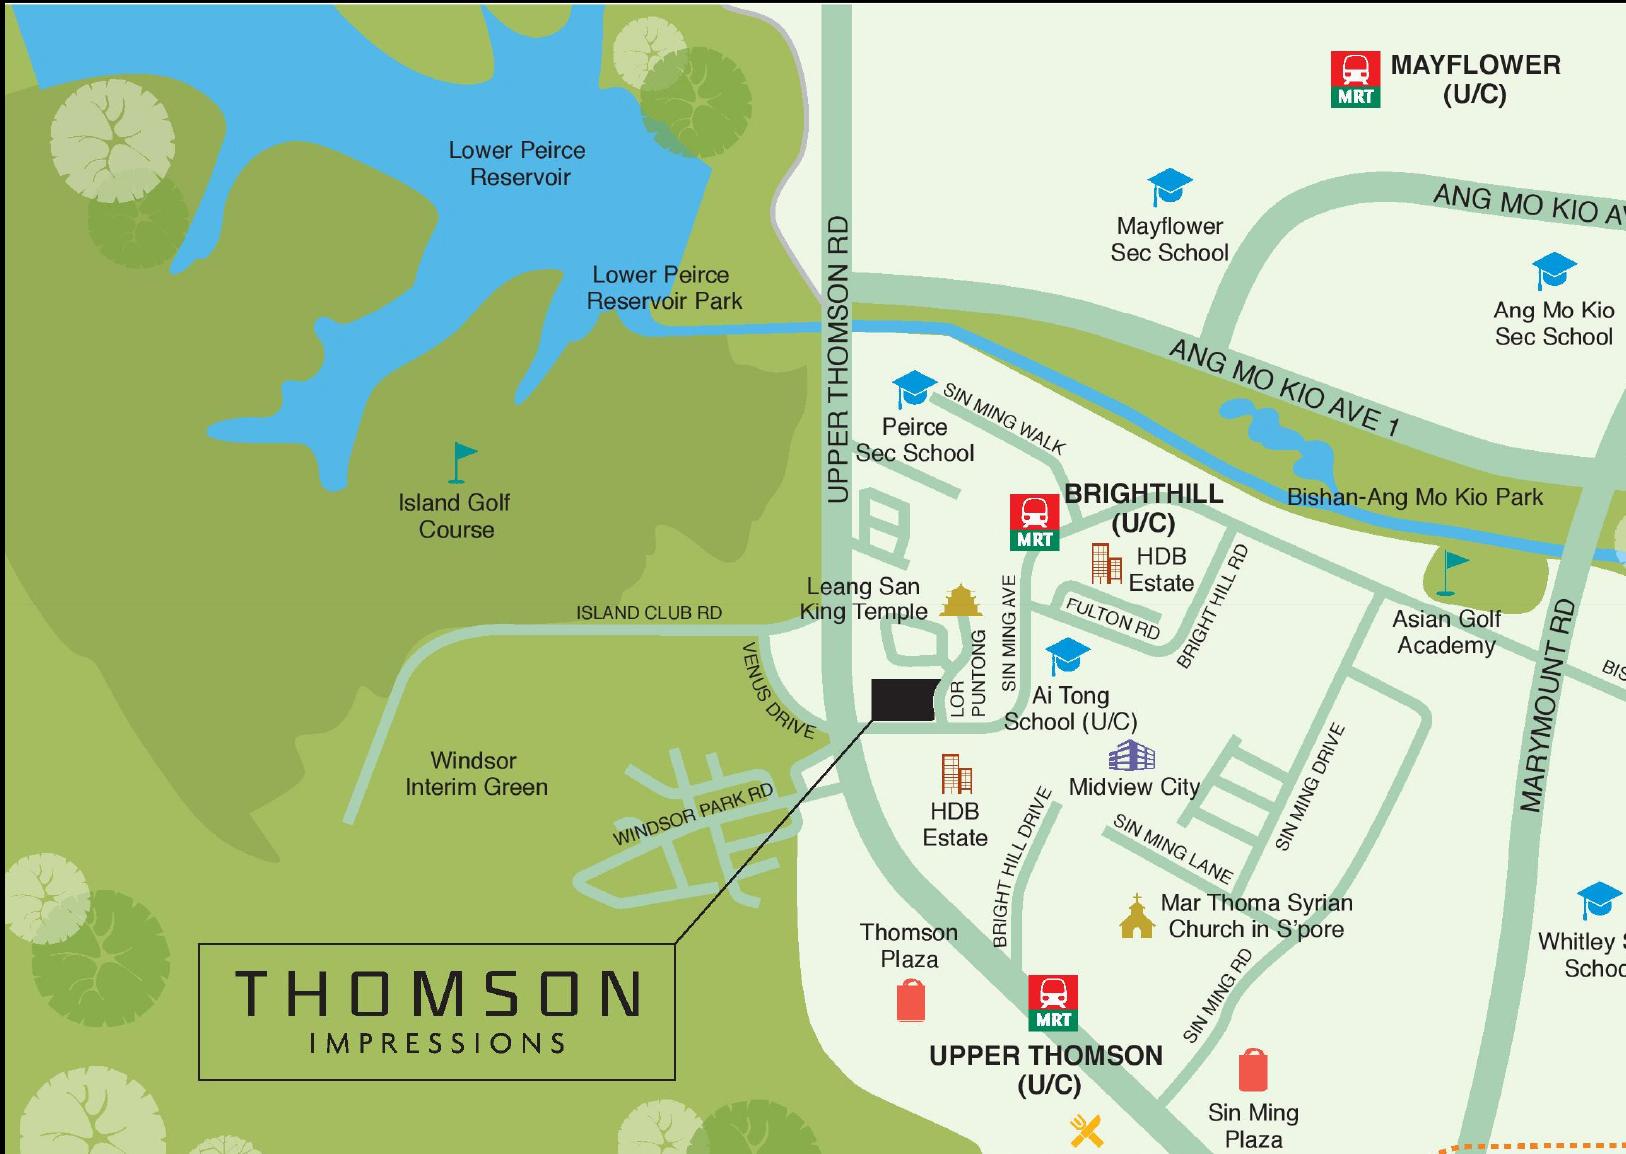 Thomsons Impressions Nature Park